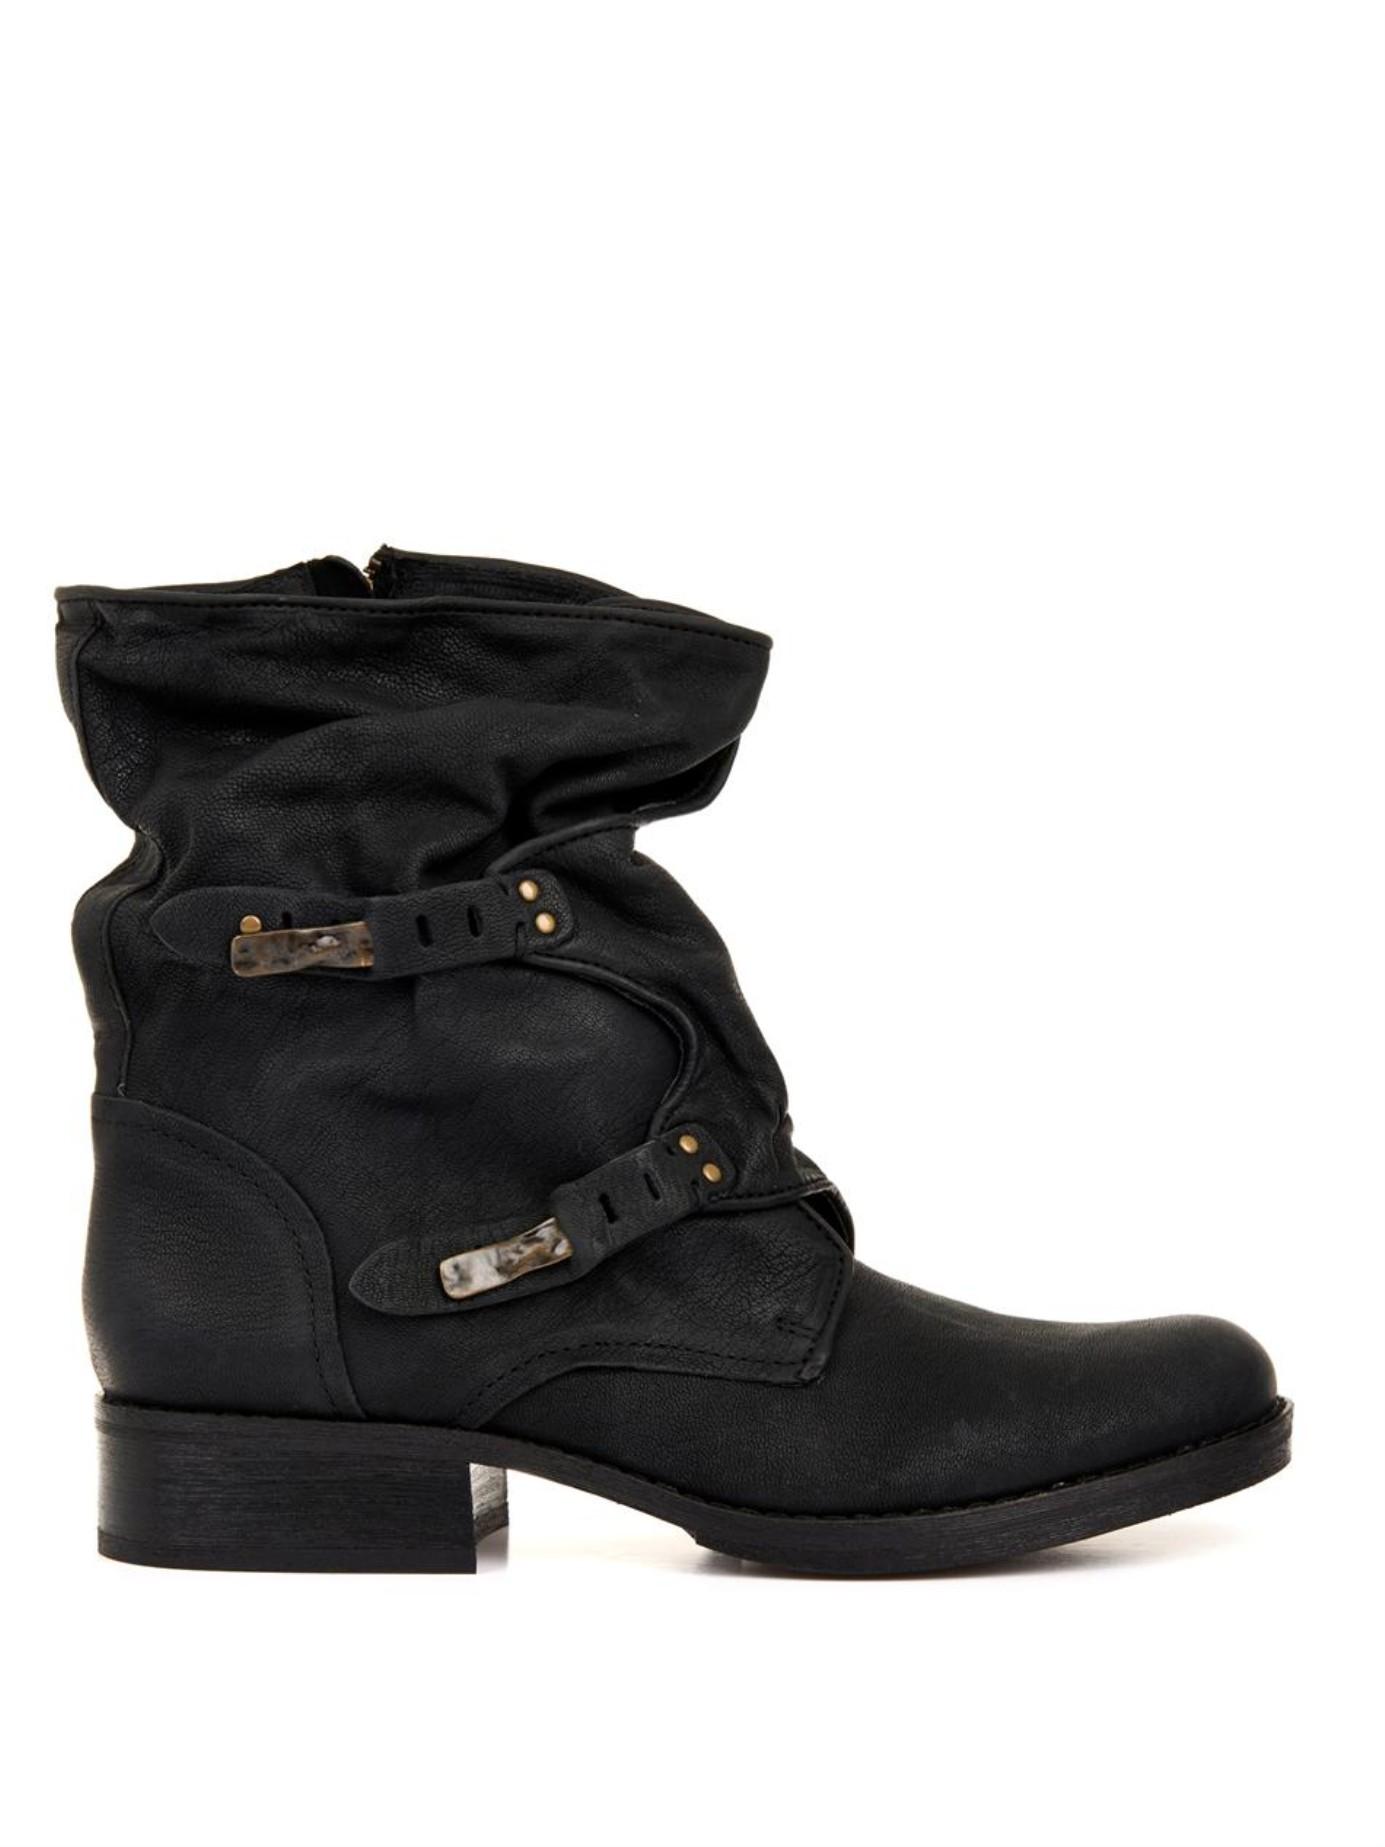 96465d8888fac Lyst - Sam Edelman Ridge Leather Boots in Black